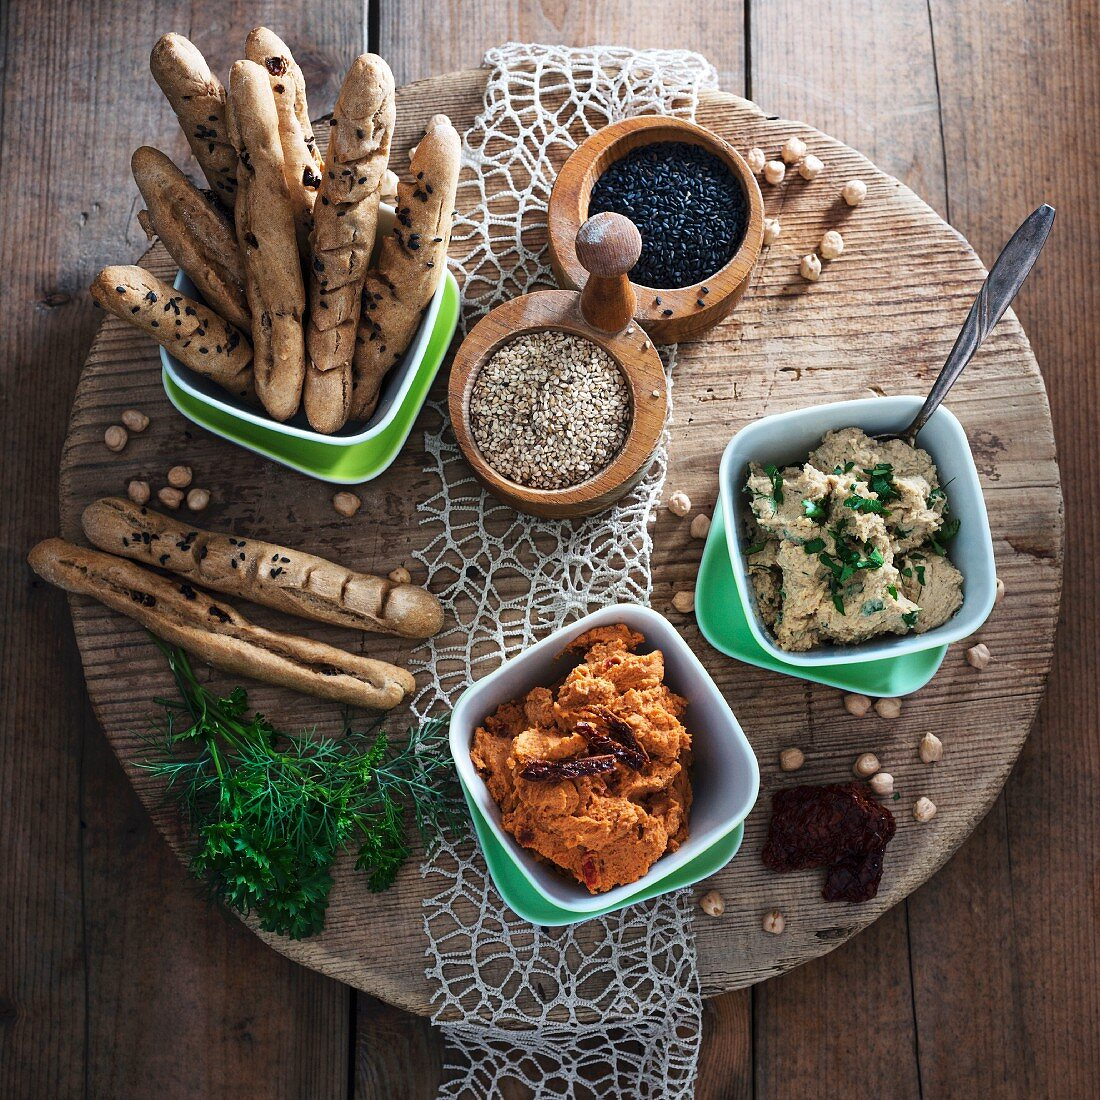 Vegan herb hummus and tomato hummus with sesame sticks